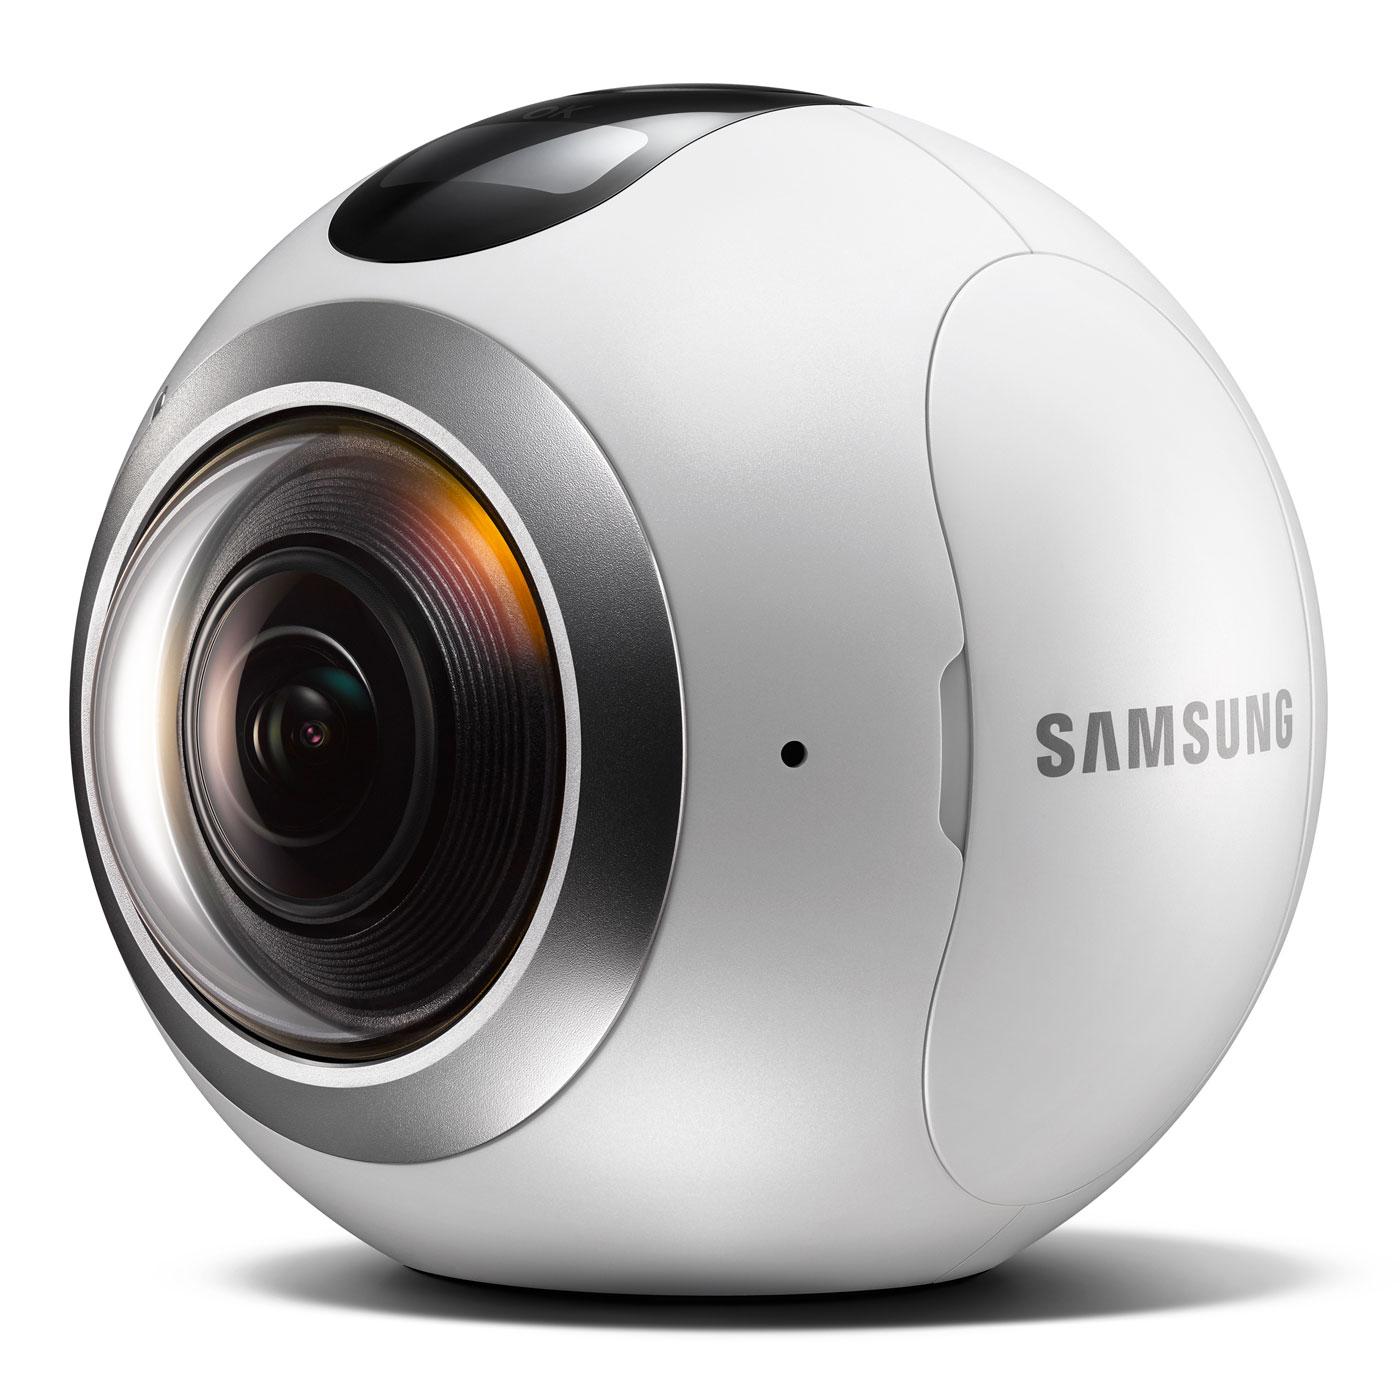 samsung gear 360 blanc sm c200nzwaxef achat vente gadget t l phone sur. Black Bedroom Furniture Sets. Home Design Ideas